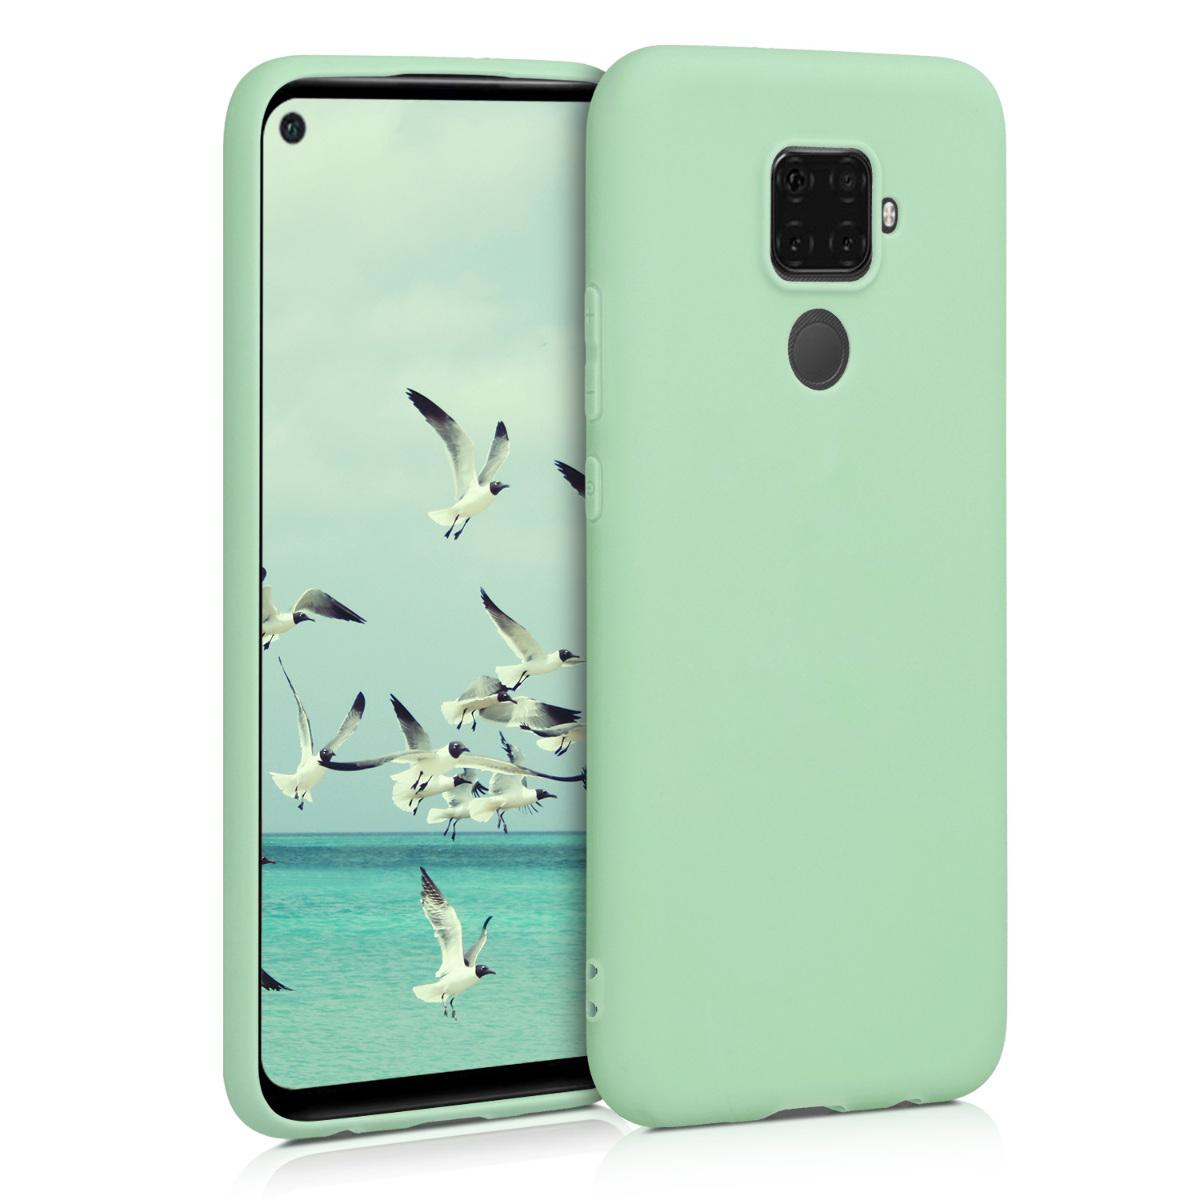 KW Θήκη Σιλικόνης Huawei Mate 30 Lite - Mint Matte (50153.50)